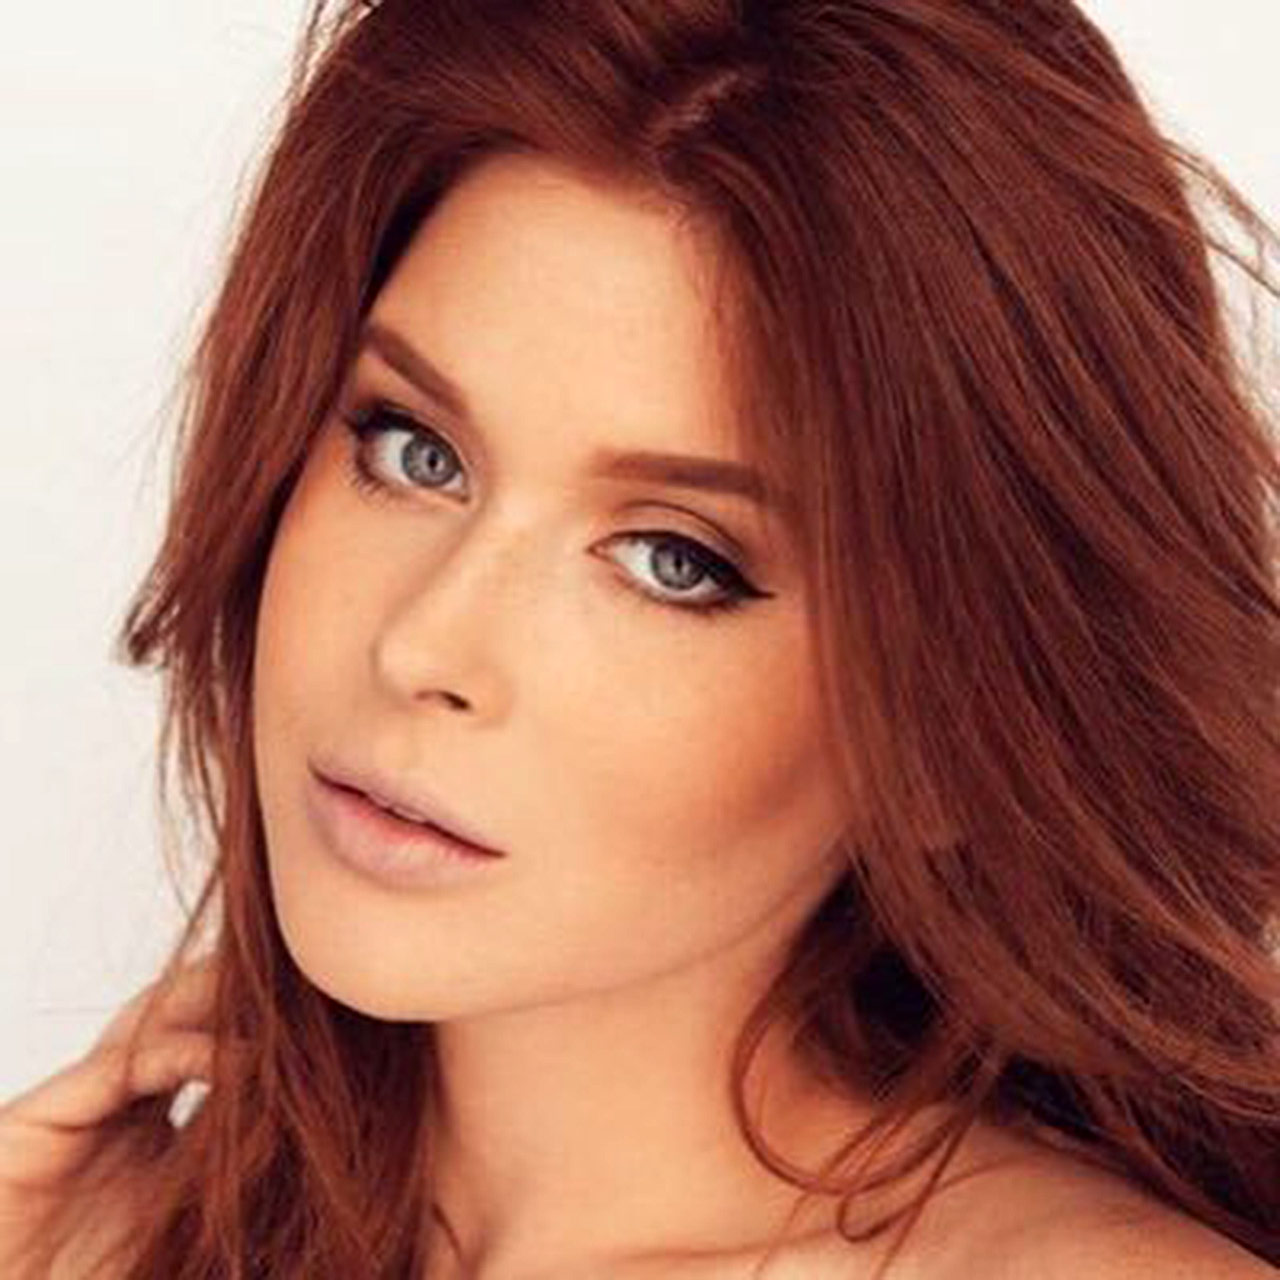 Celebrity leaked nudes renee